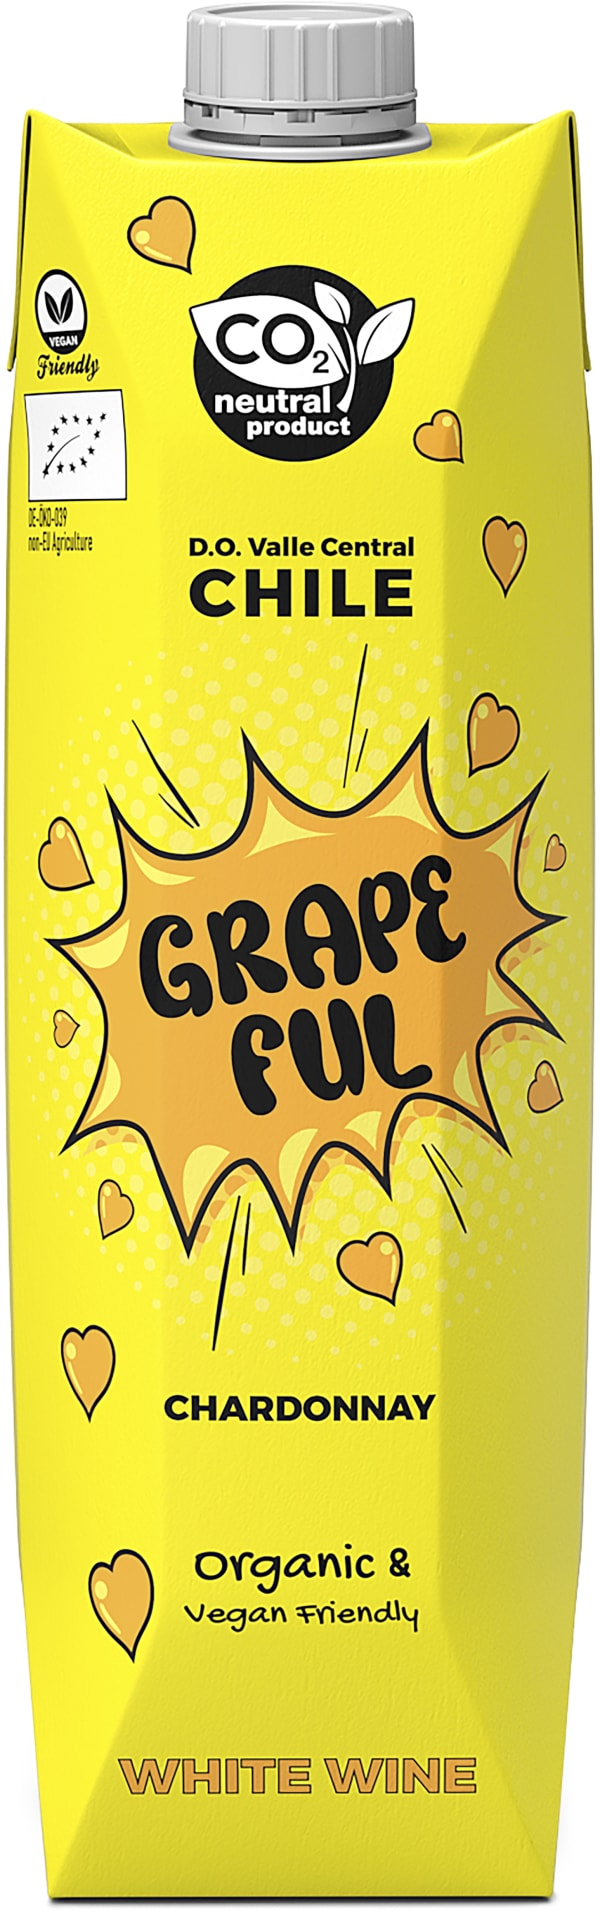 Grapeful Chardonnay Organic 2020 kartongförpackning